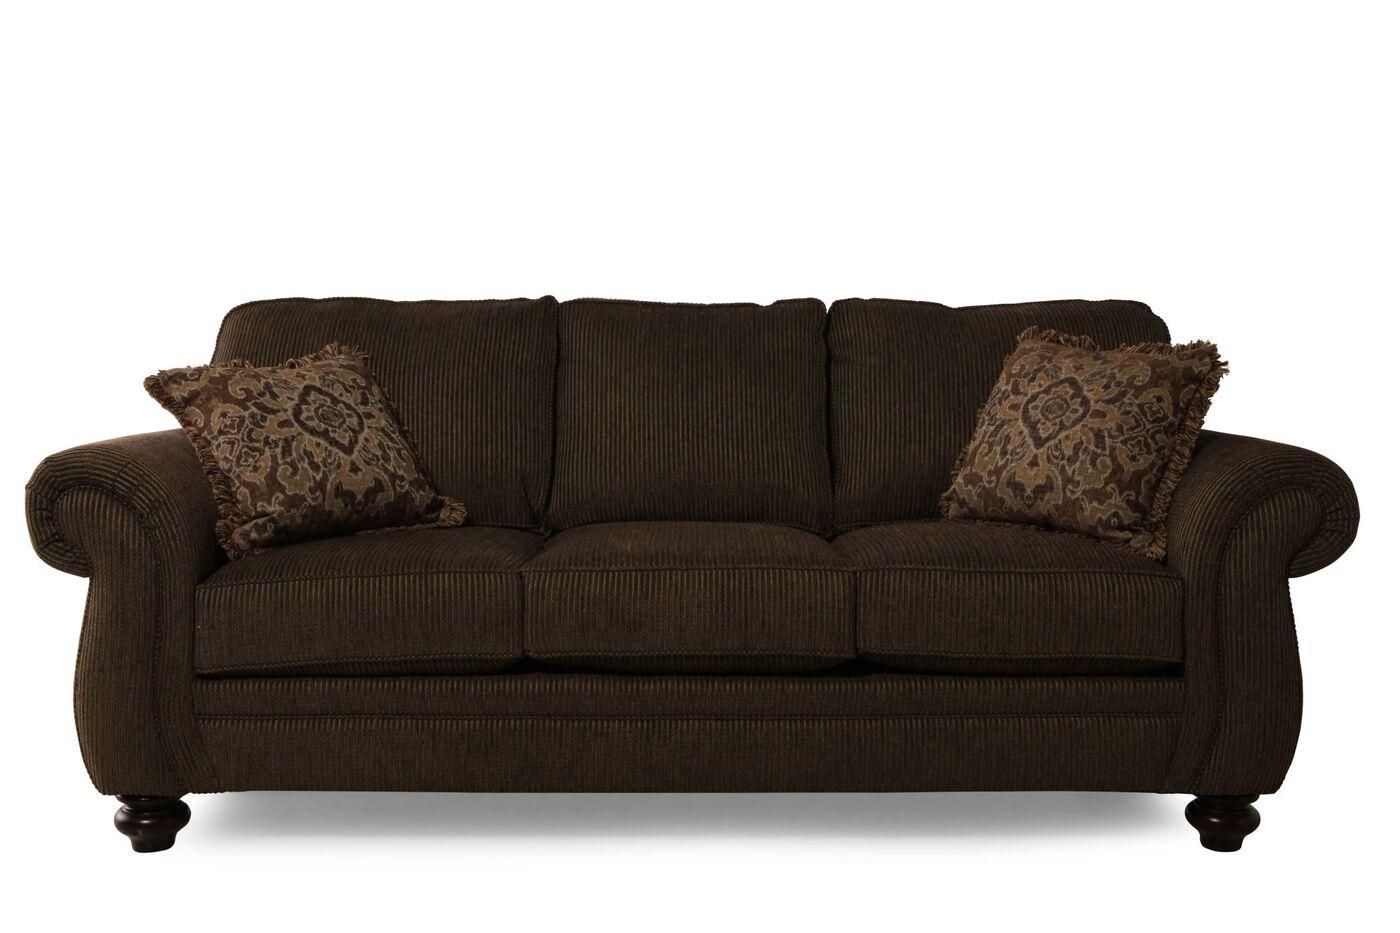 Broyhill Cassandra Sofa   Mathis Brothers Furniture